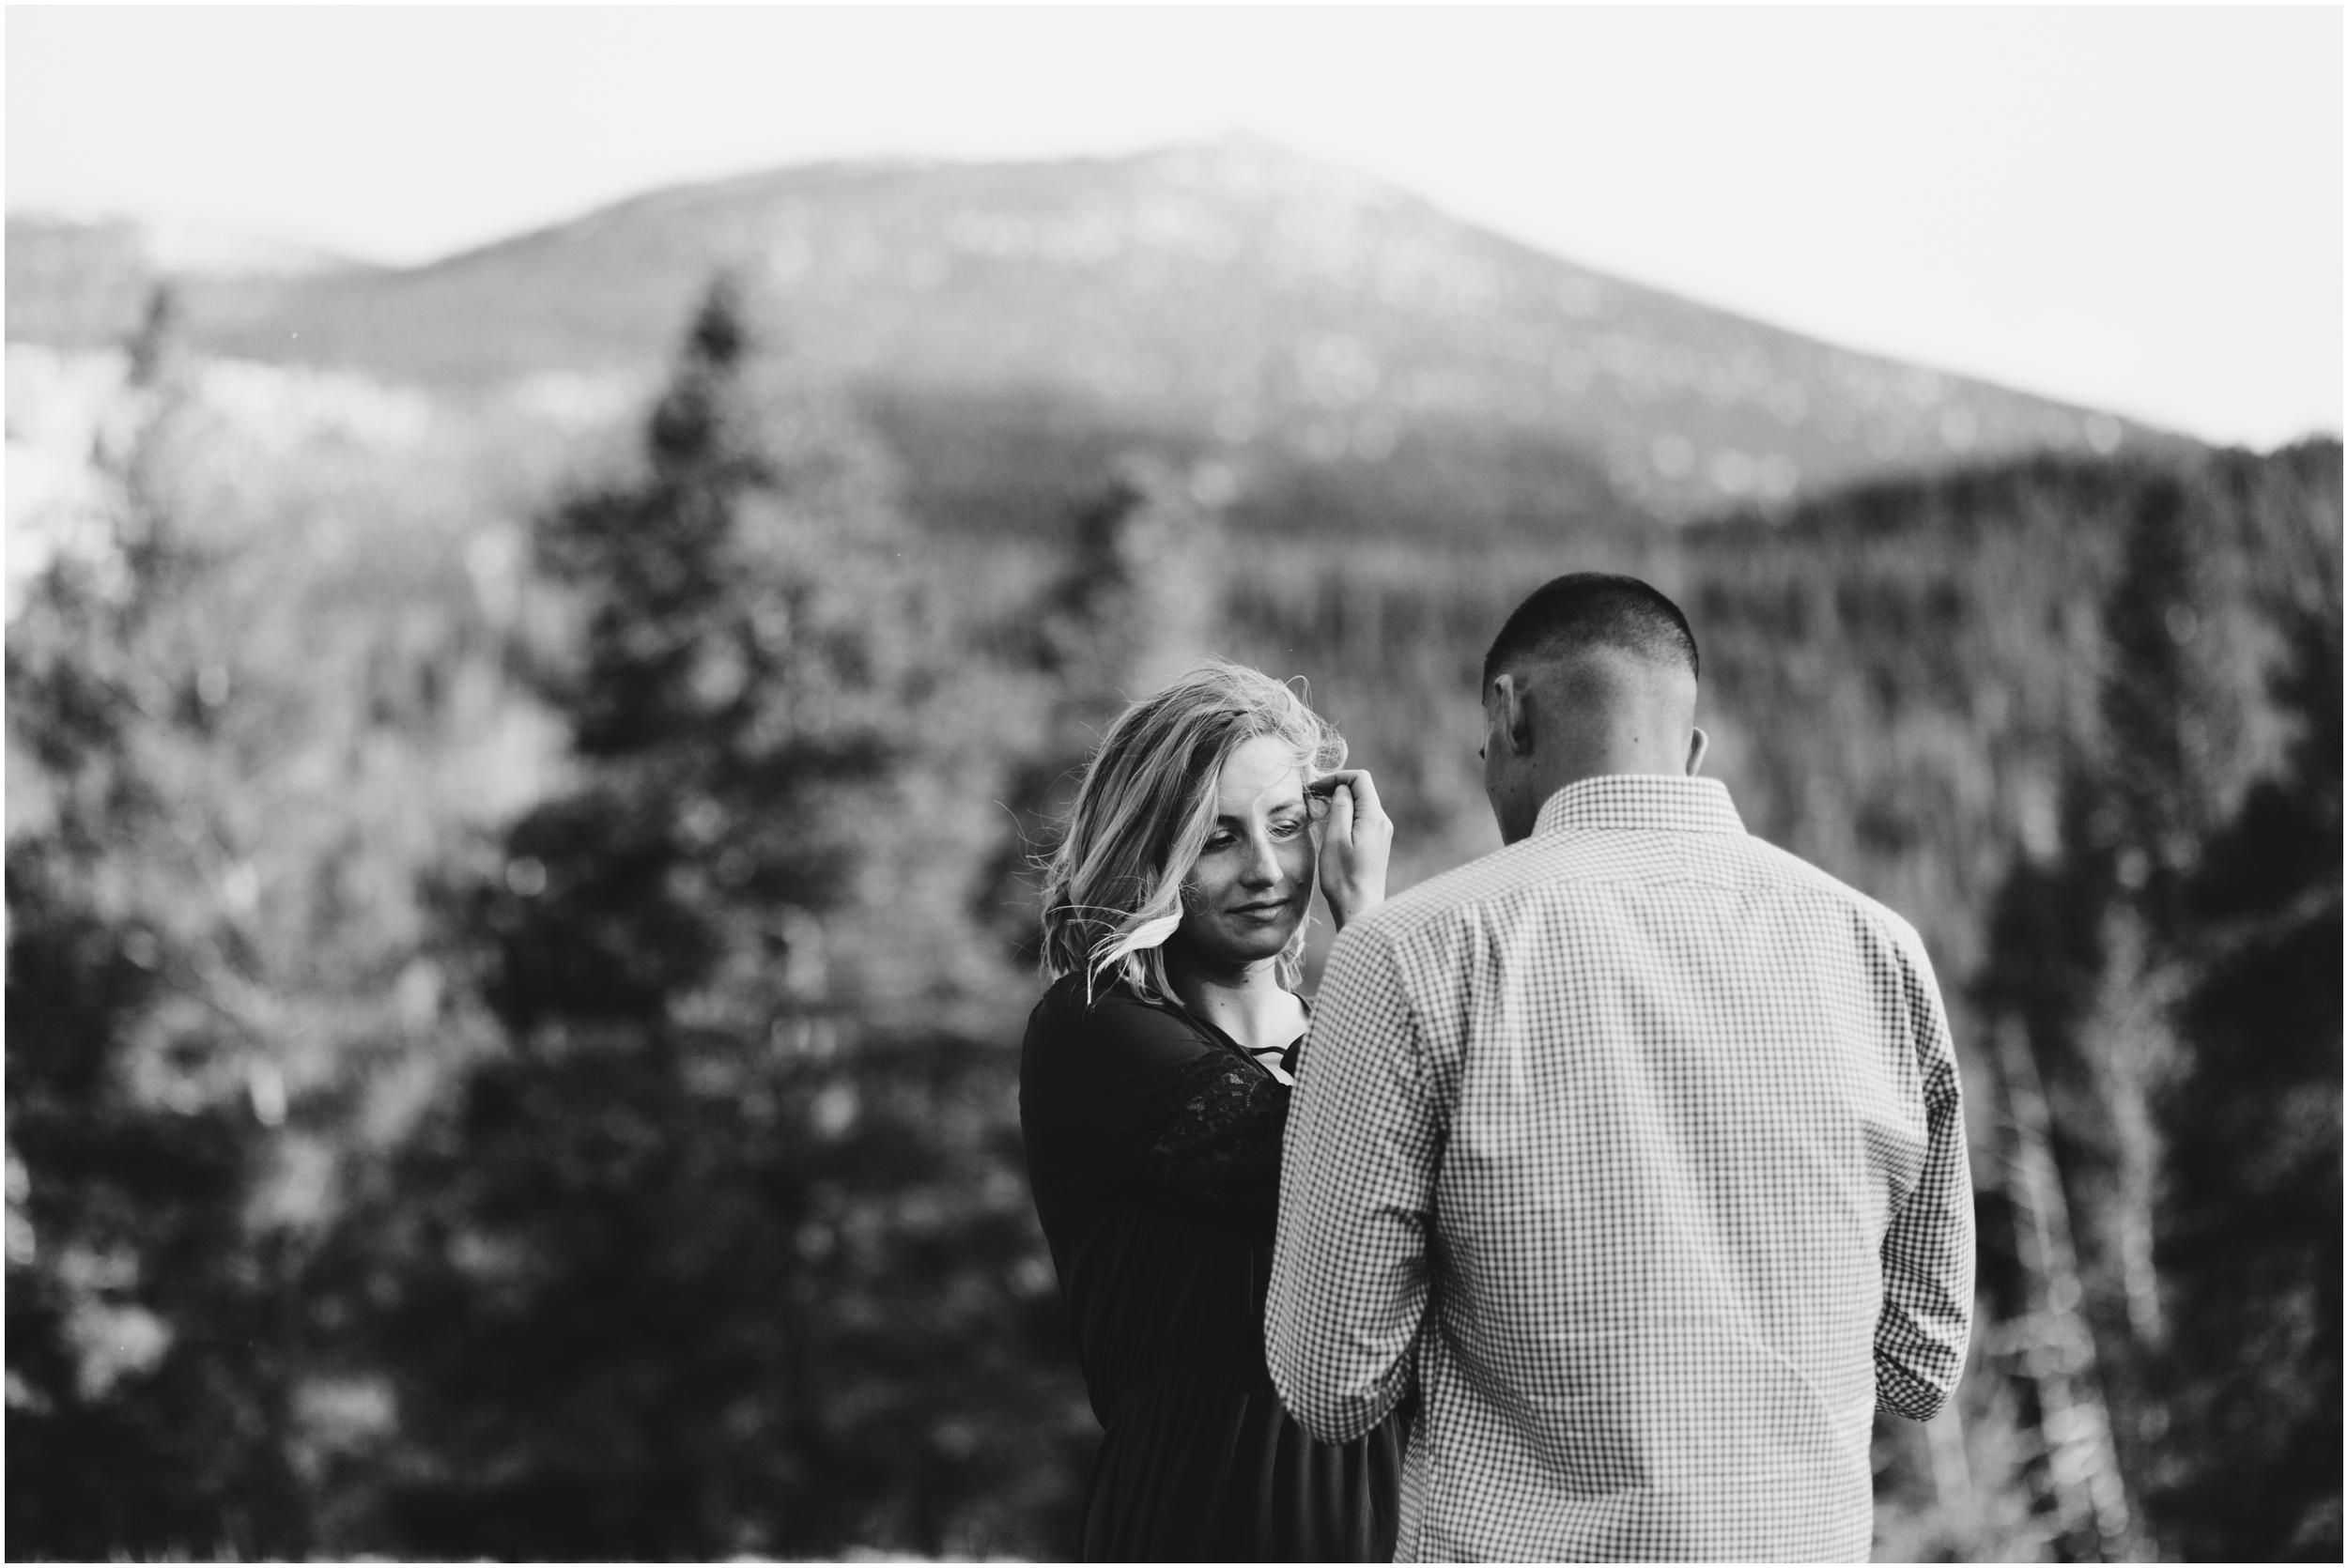 rocky-mountain-national-park-elopement-sprague-lake-colorado-adventure-wedding-photographer_taylor-powers_65.jpg